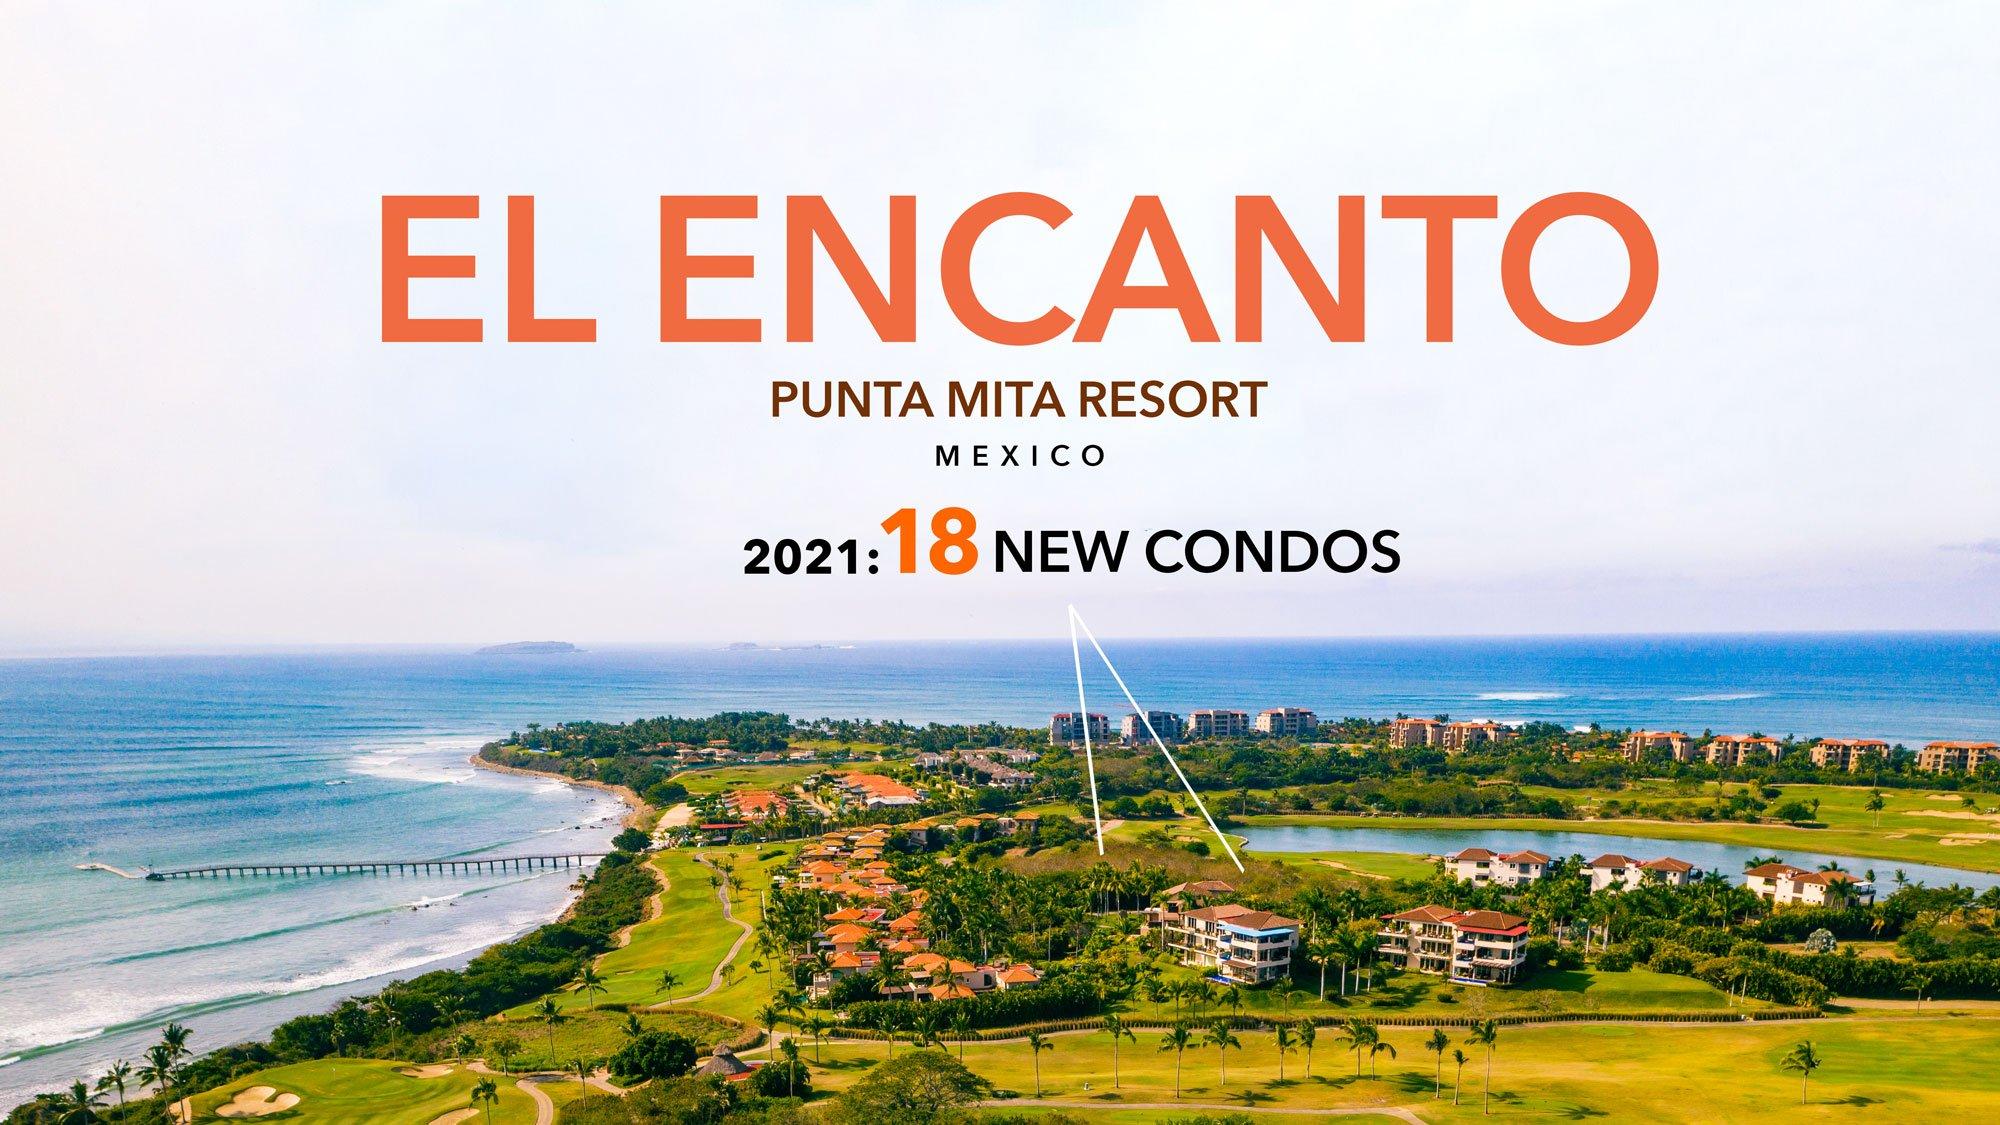 NEW: El Encanto condos on the Jack Nicklaus golf course at the Punta Mita Resort, Riviera Nayarit, Mexico